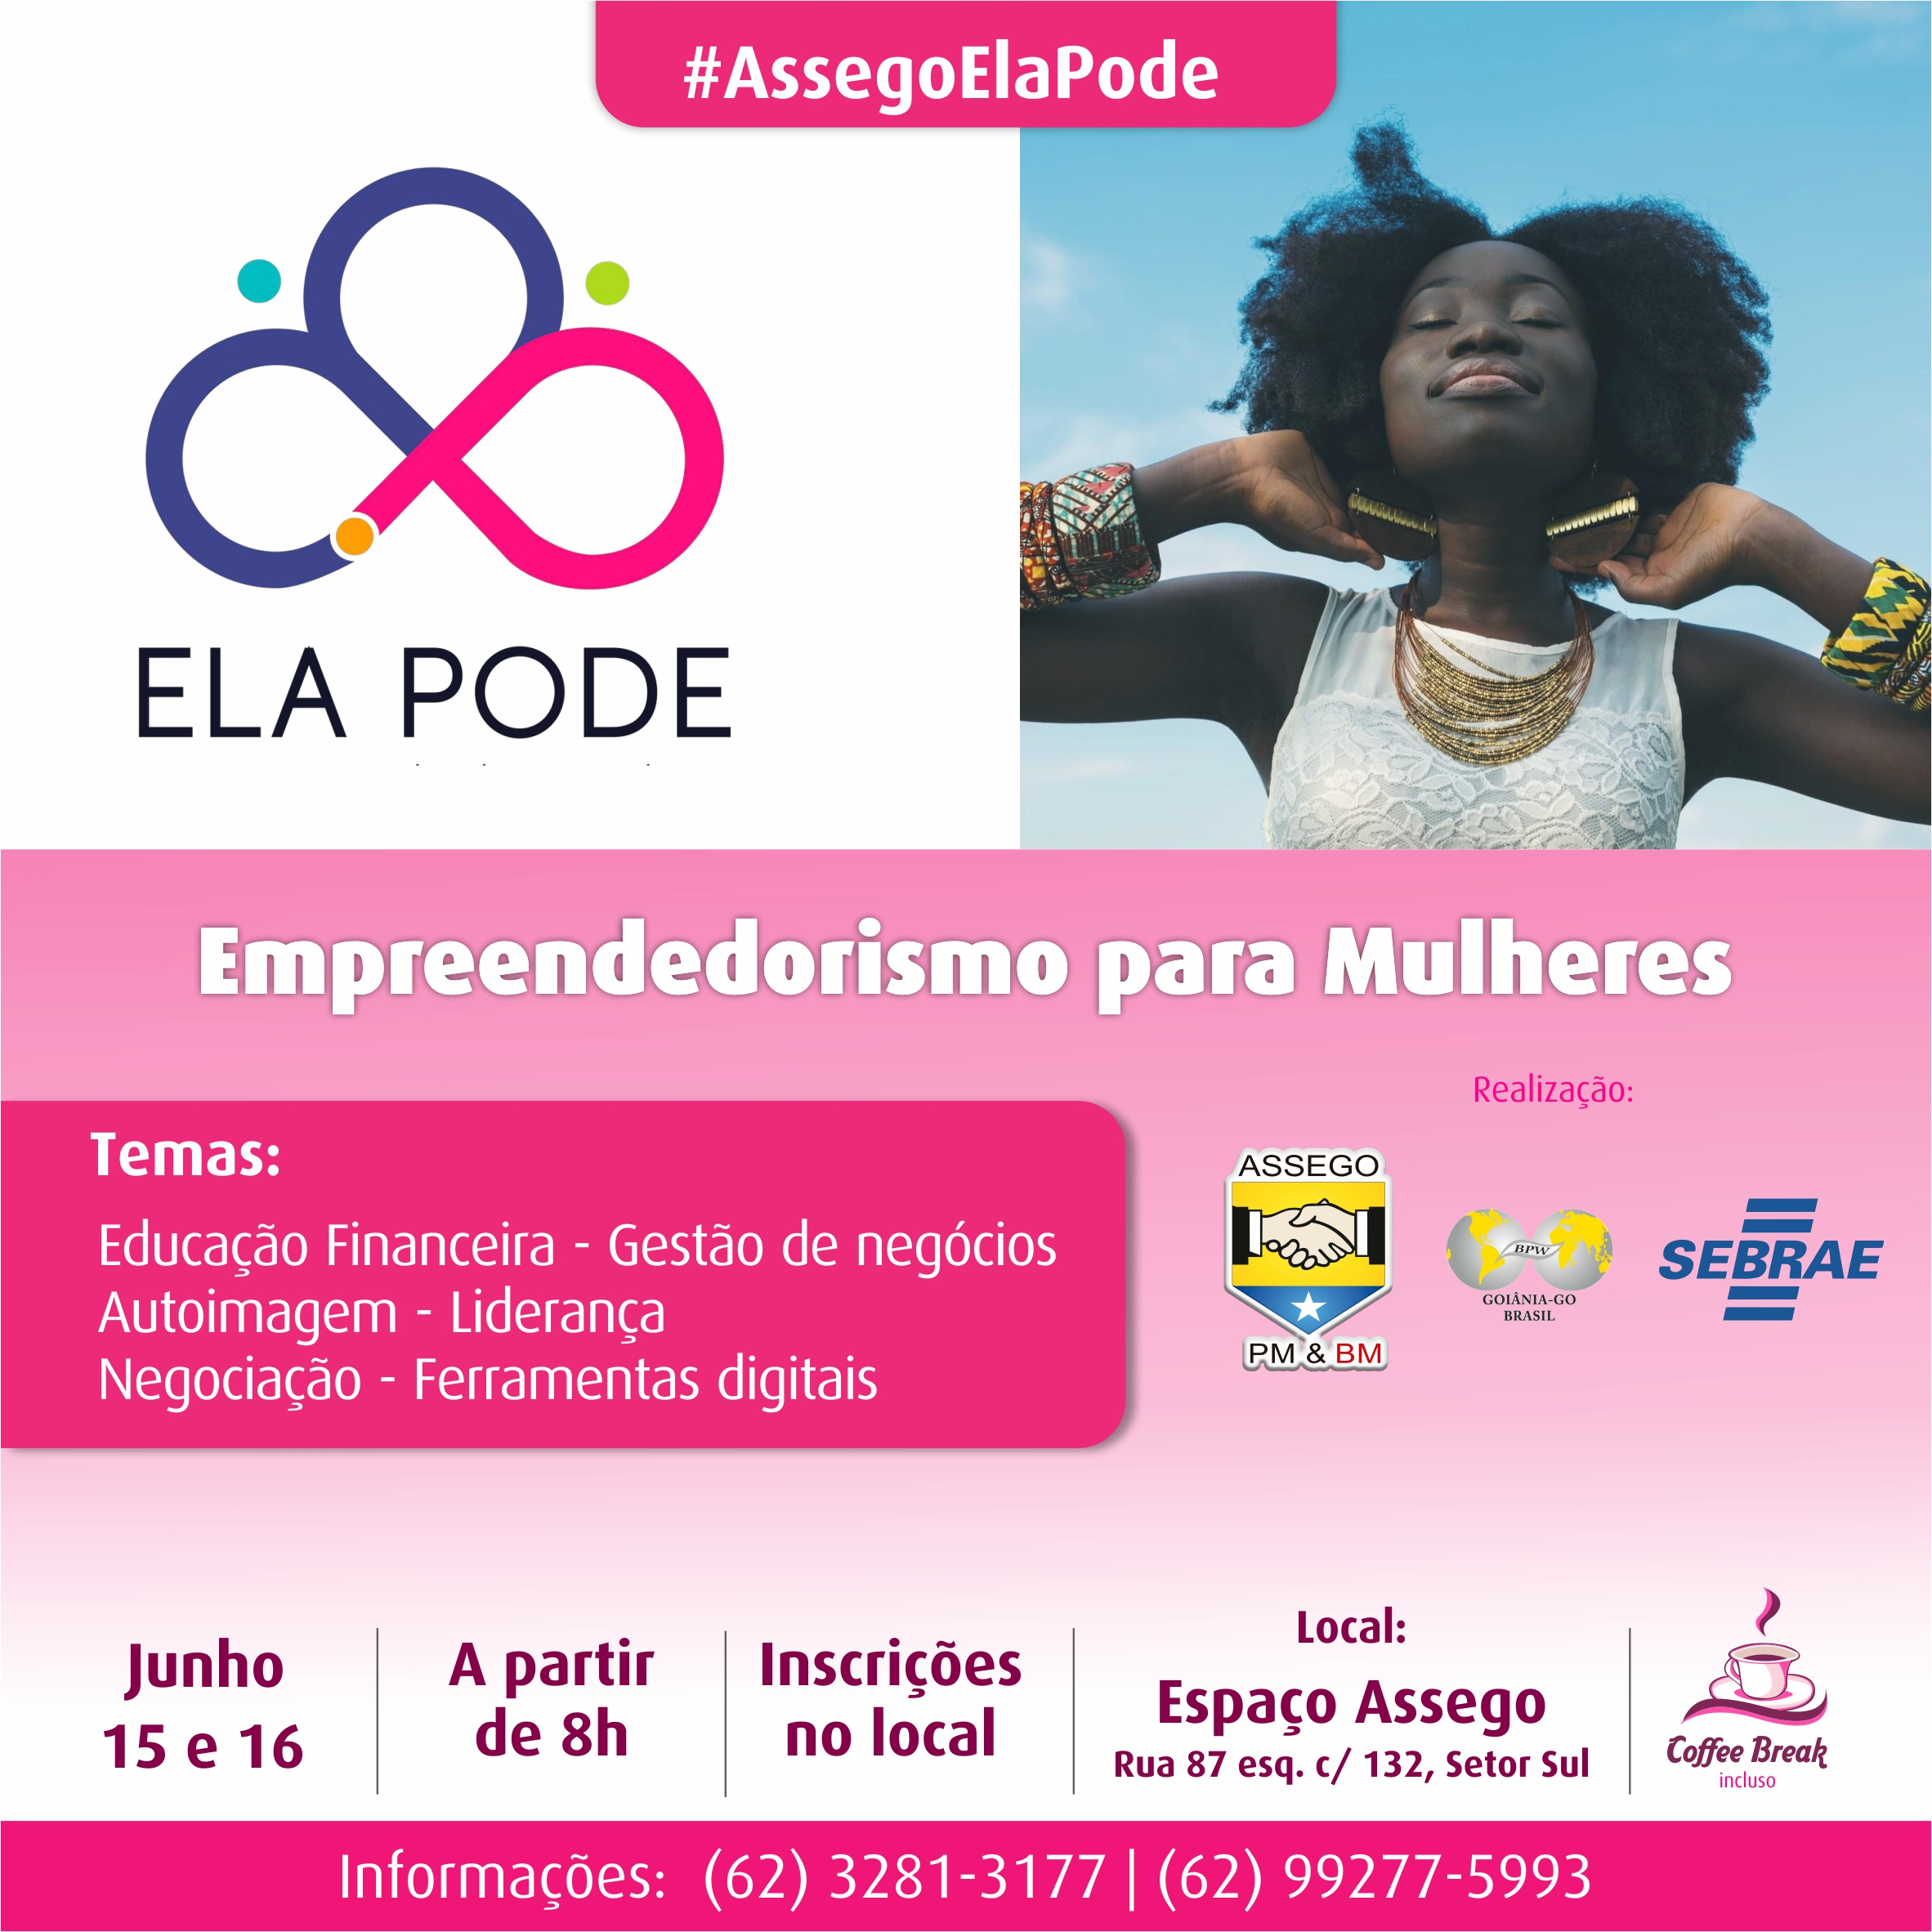 Assego oferece Workshop de Empreendedorismo para mulheres